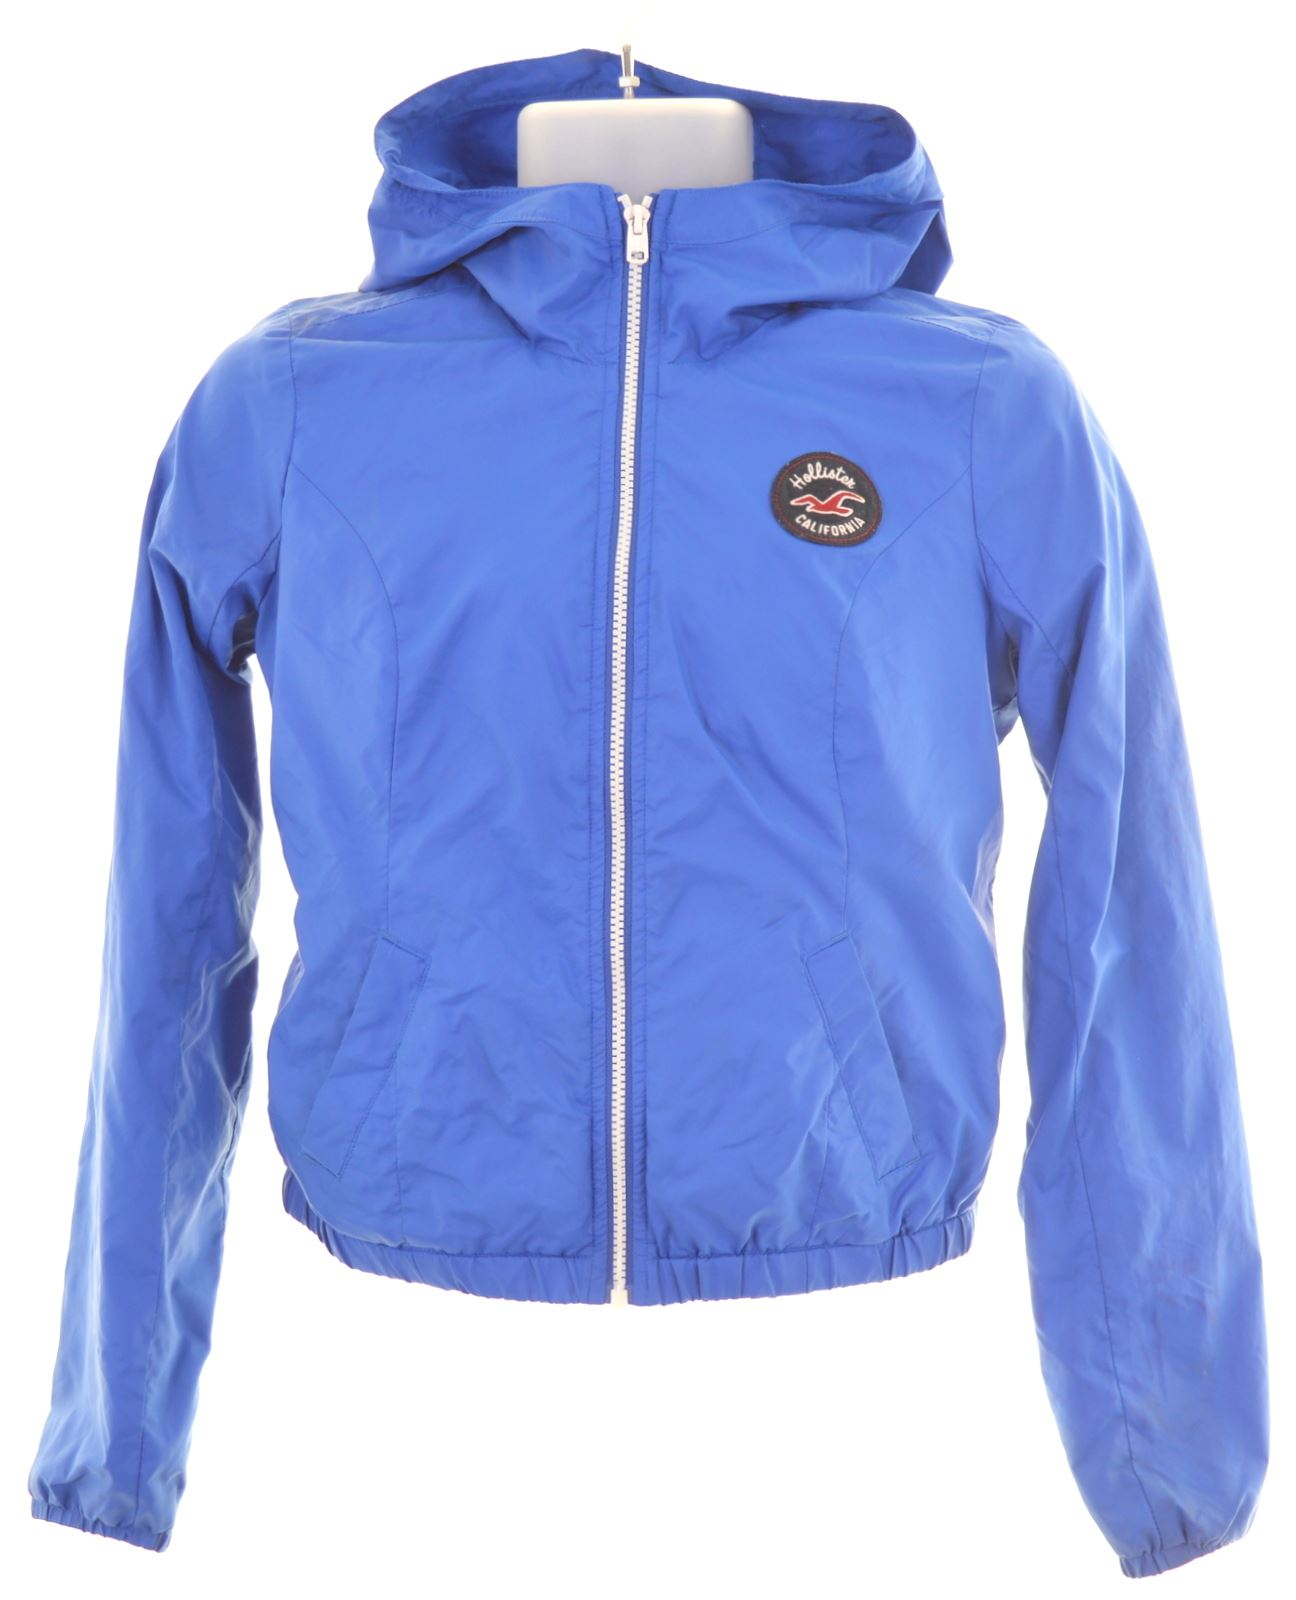 HOLLISTER Boys Rain Jacket 8-9 Years Small Blue Nylon KK08   eBay